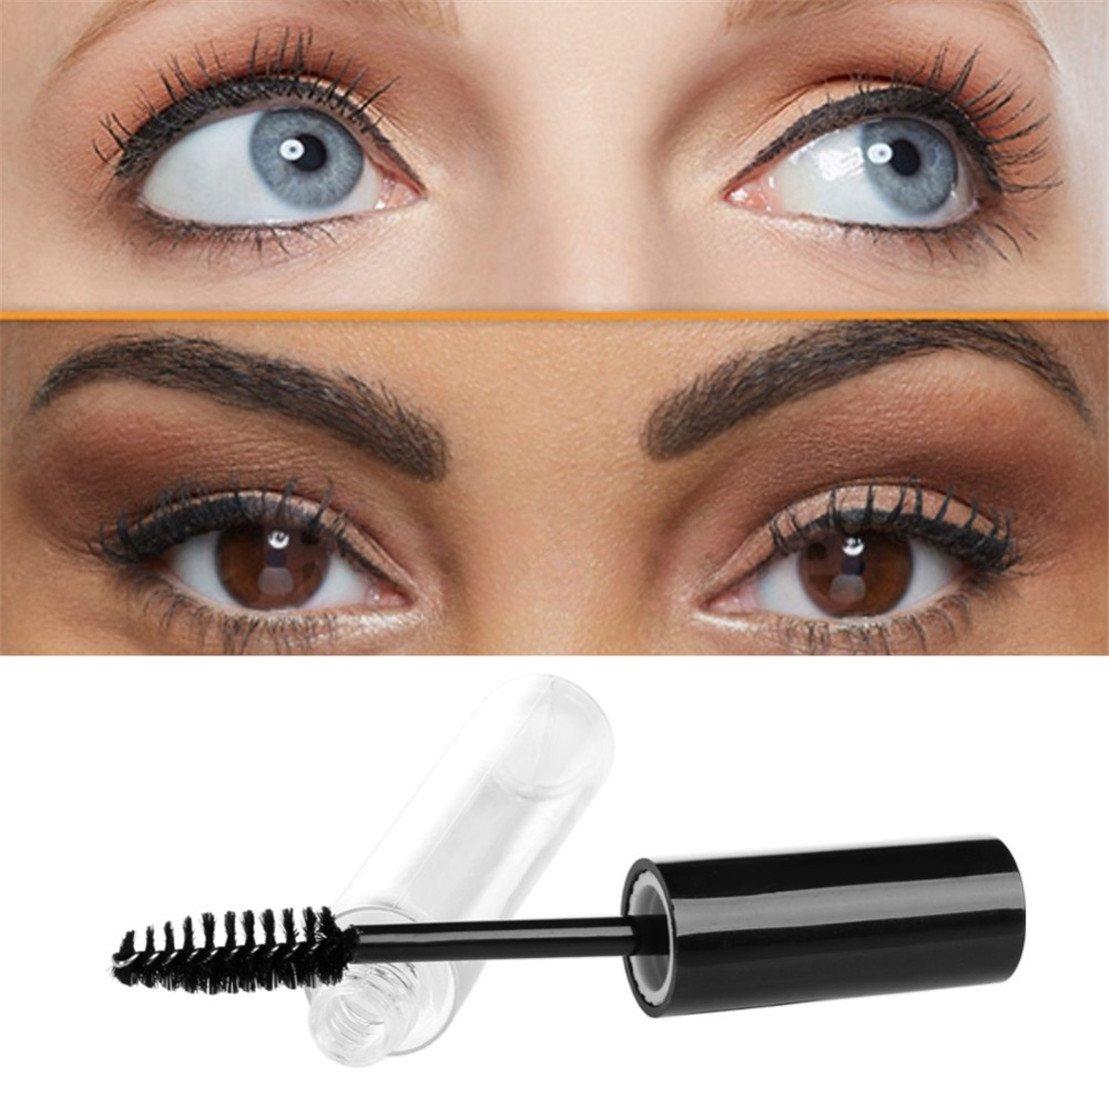 1 pcs 10mL Empty Mascara Tube Eyelash Cream Vial/Liquid Bottle/Container Black Cap